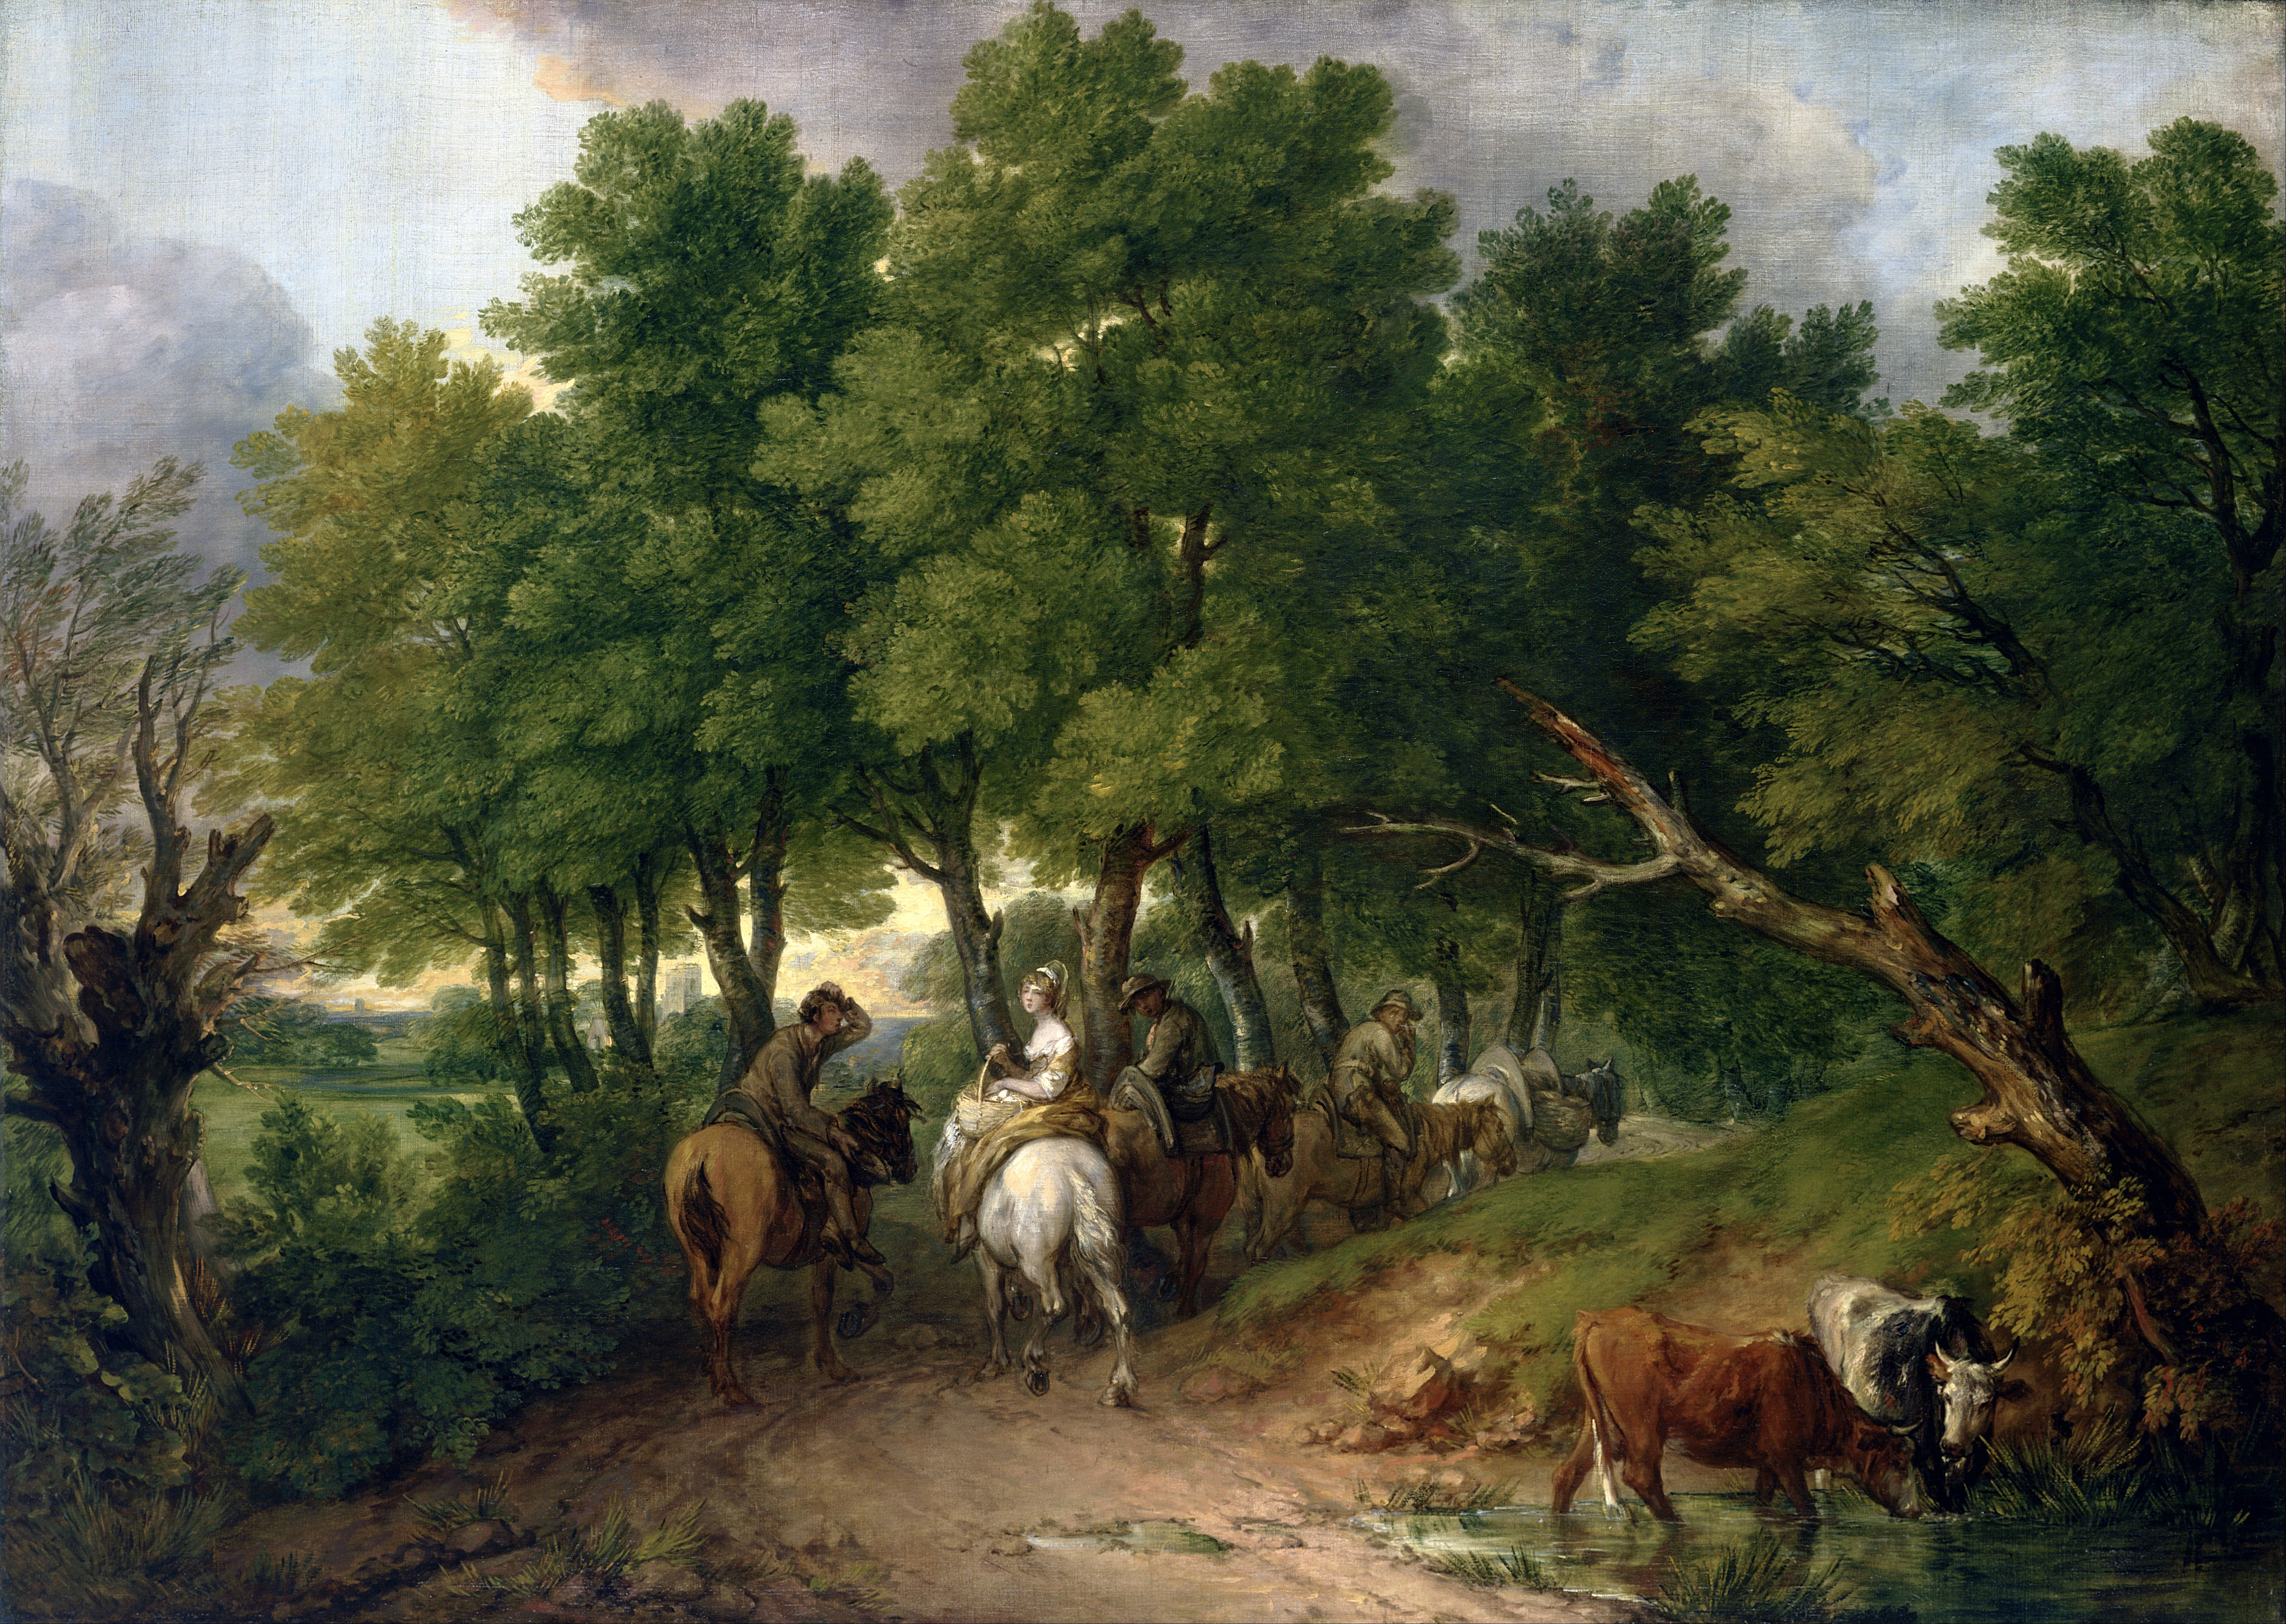 Thomas_Gainsborough_-_Road_from_Market_-_Google_Art_Project